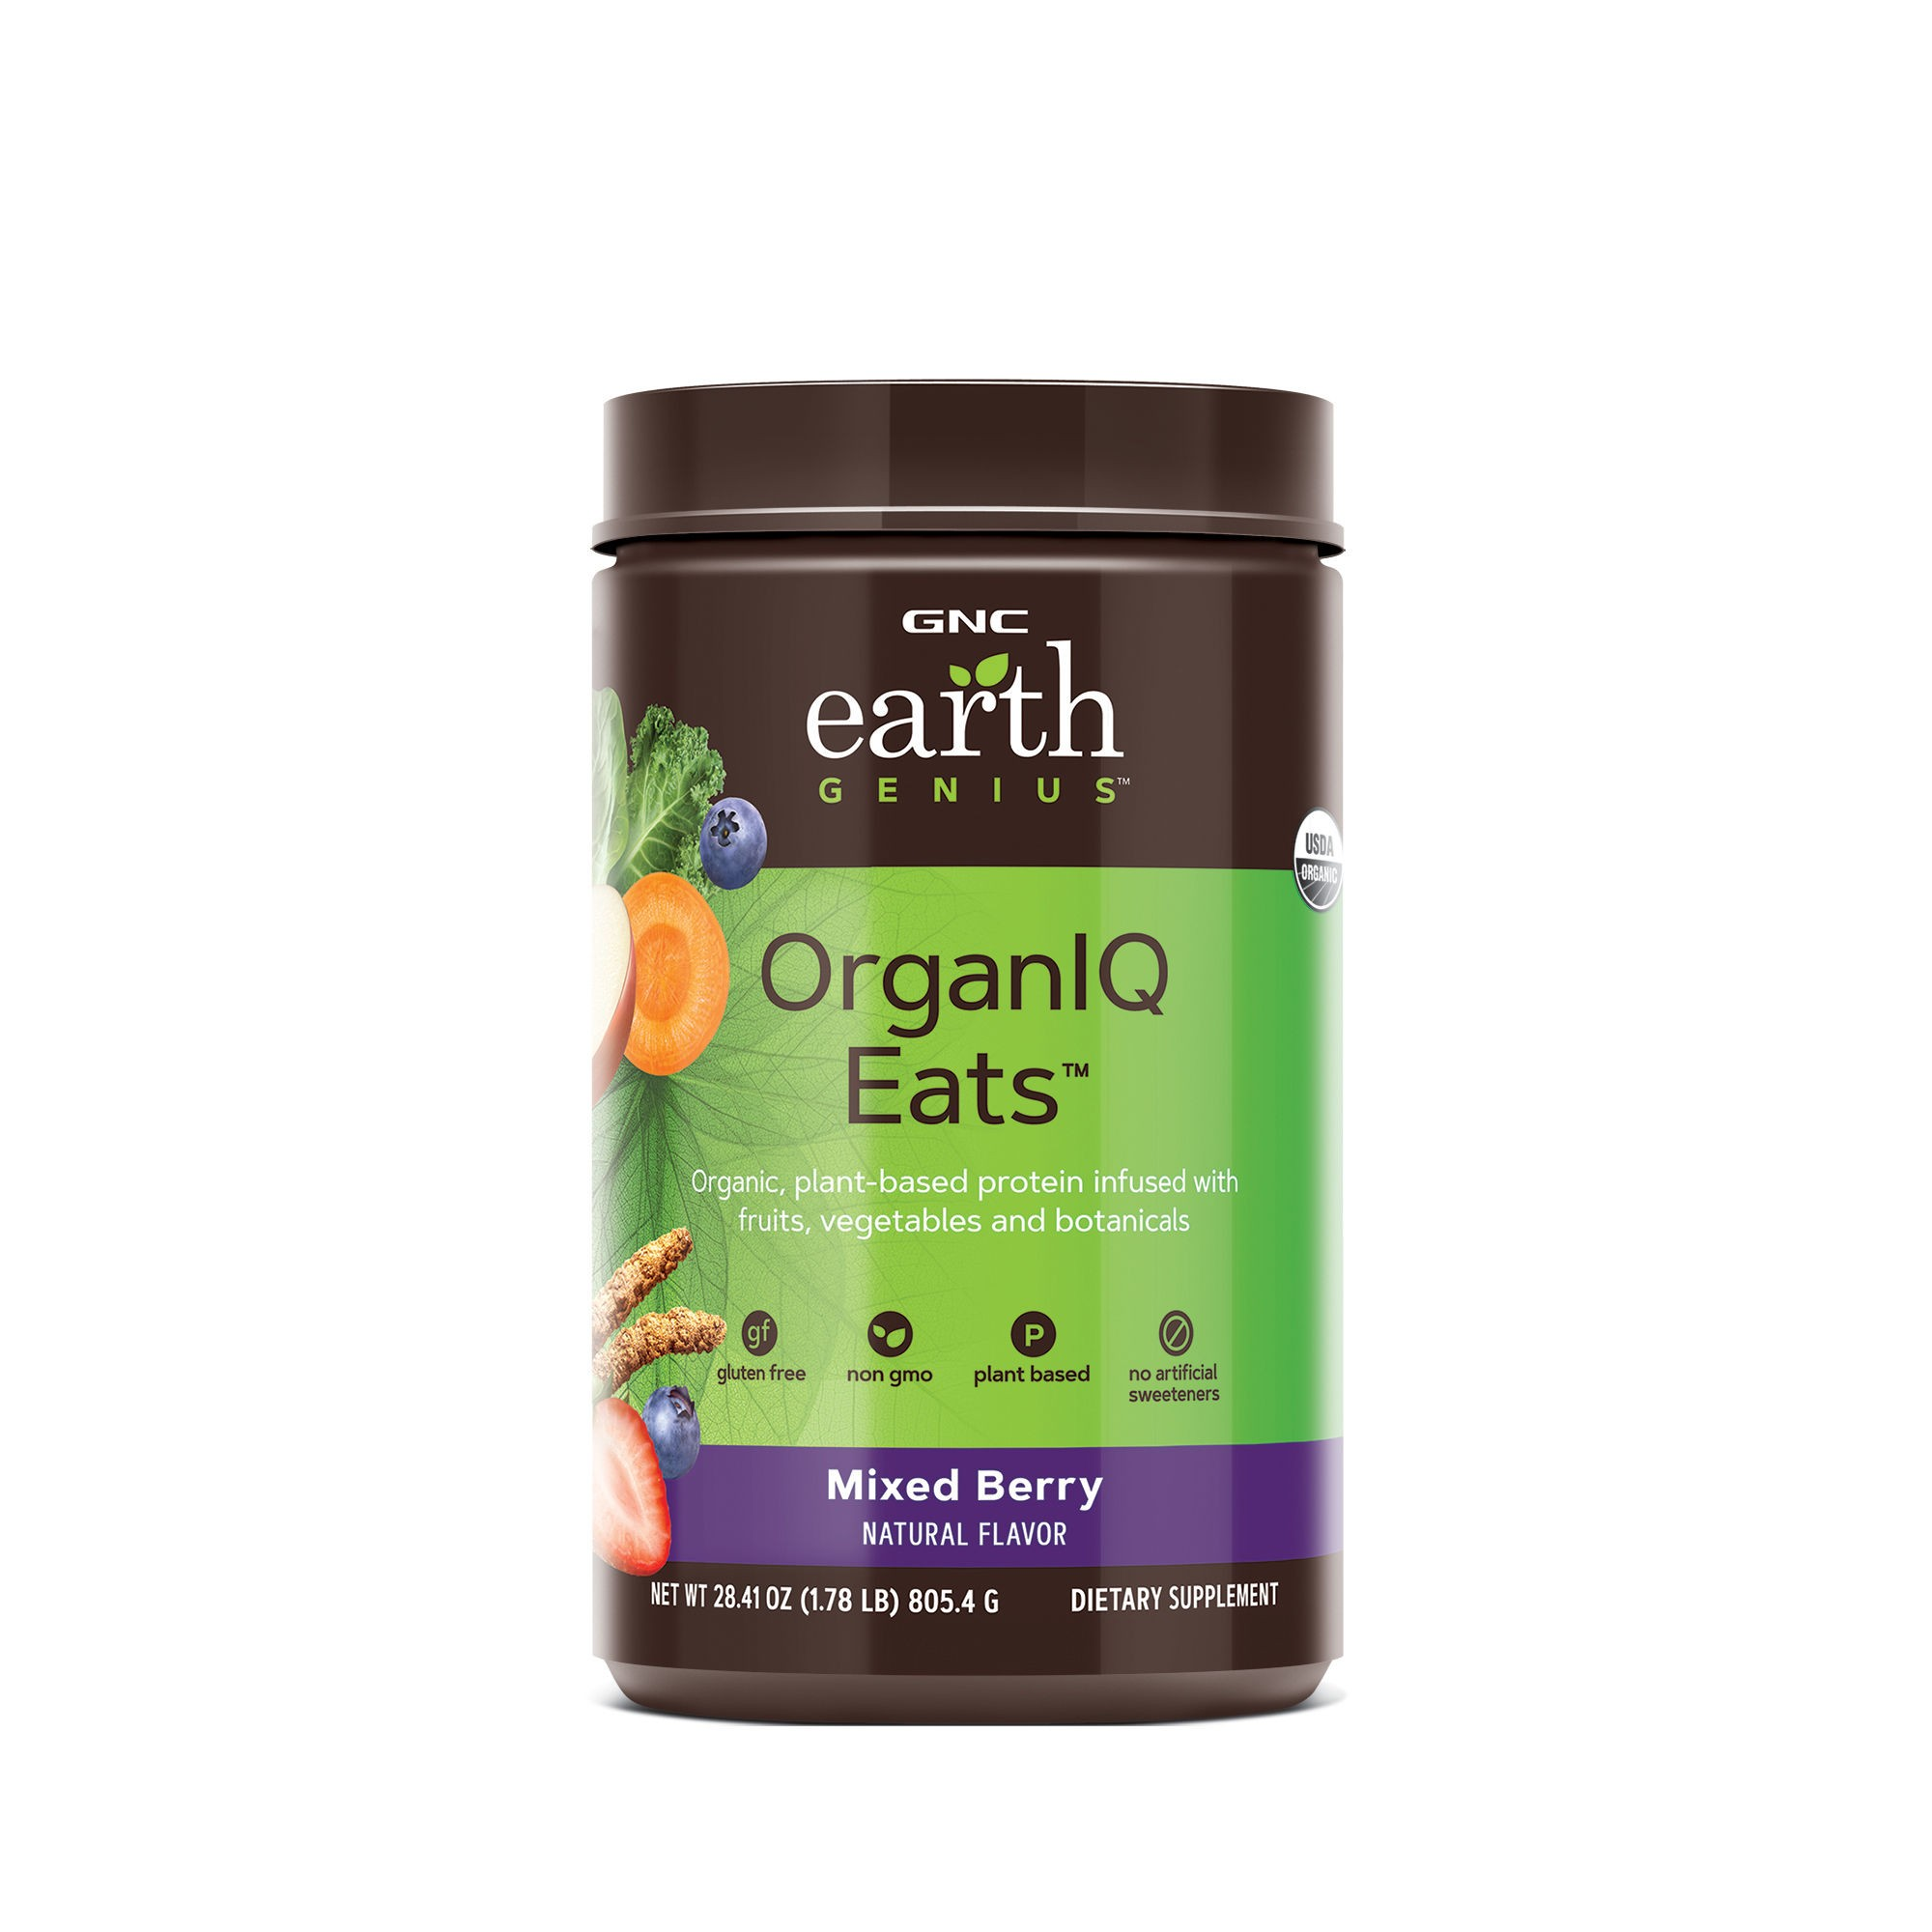 GNC Earth Genius™ OrganIQ Eats™, Pudra Proteica Vegana cu Aroma de Fructe de Padure, 805.4 g